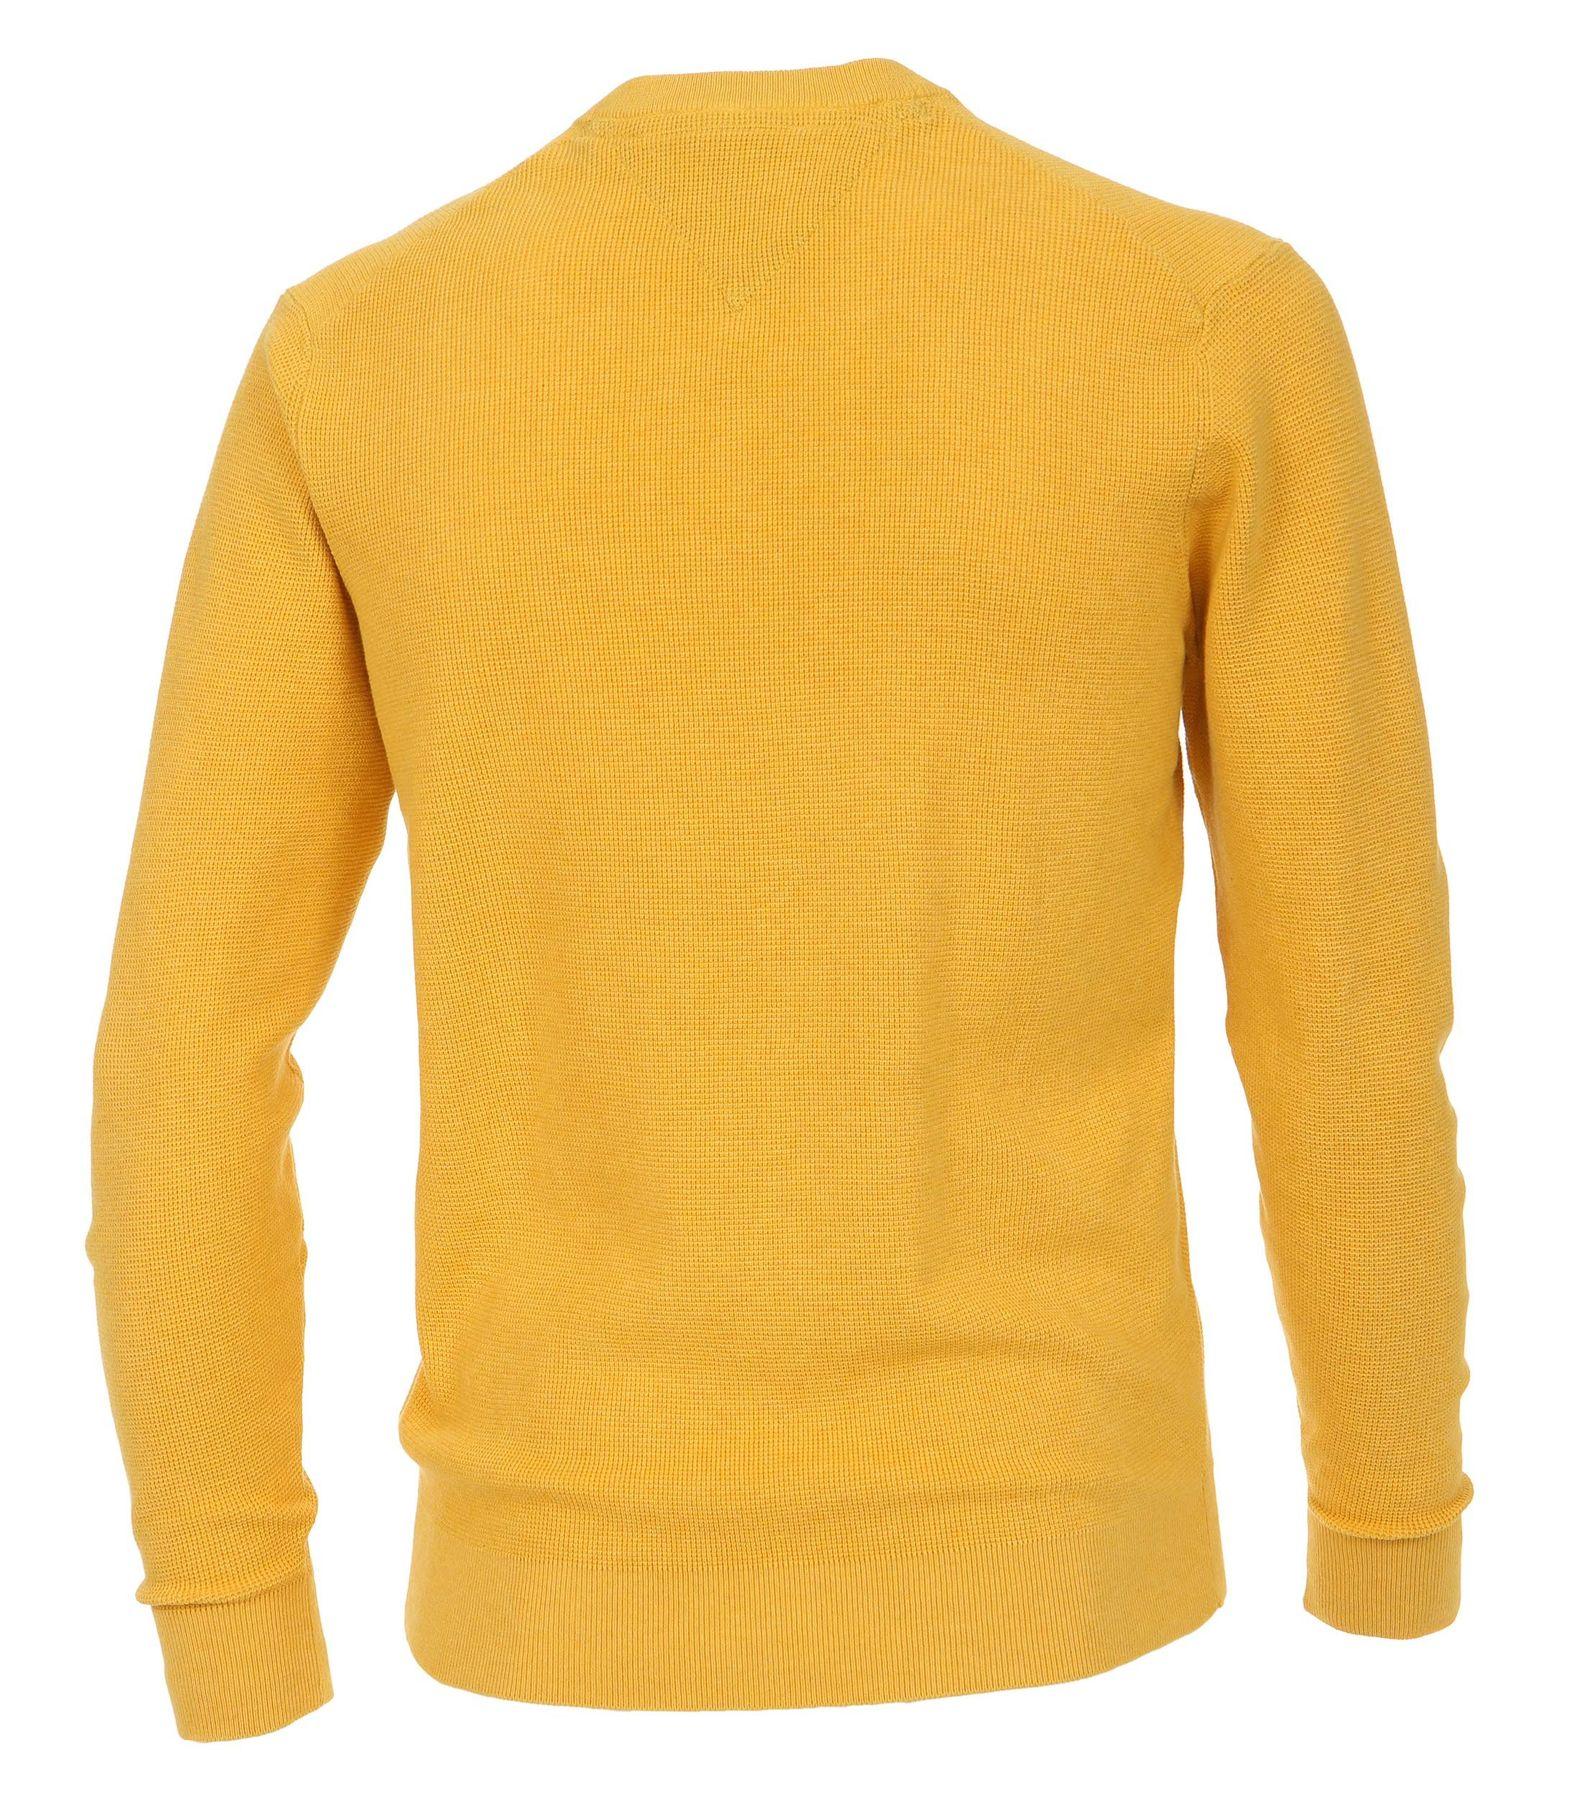 Casa Moda - Unifarbener Herren Pullover mit V-Ausschnitt  (472625000) – Bild 14